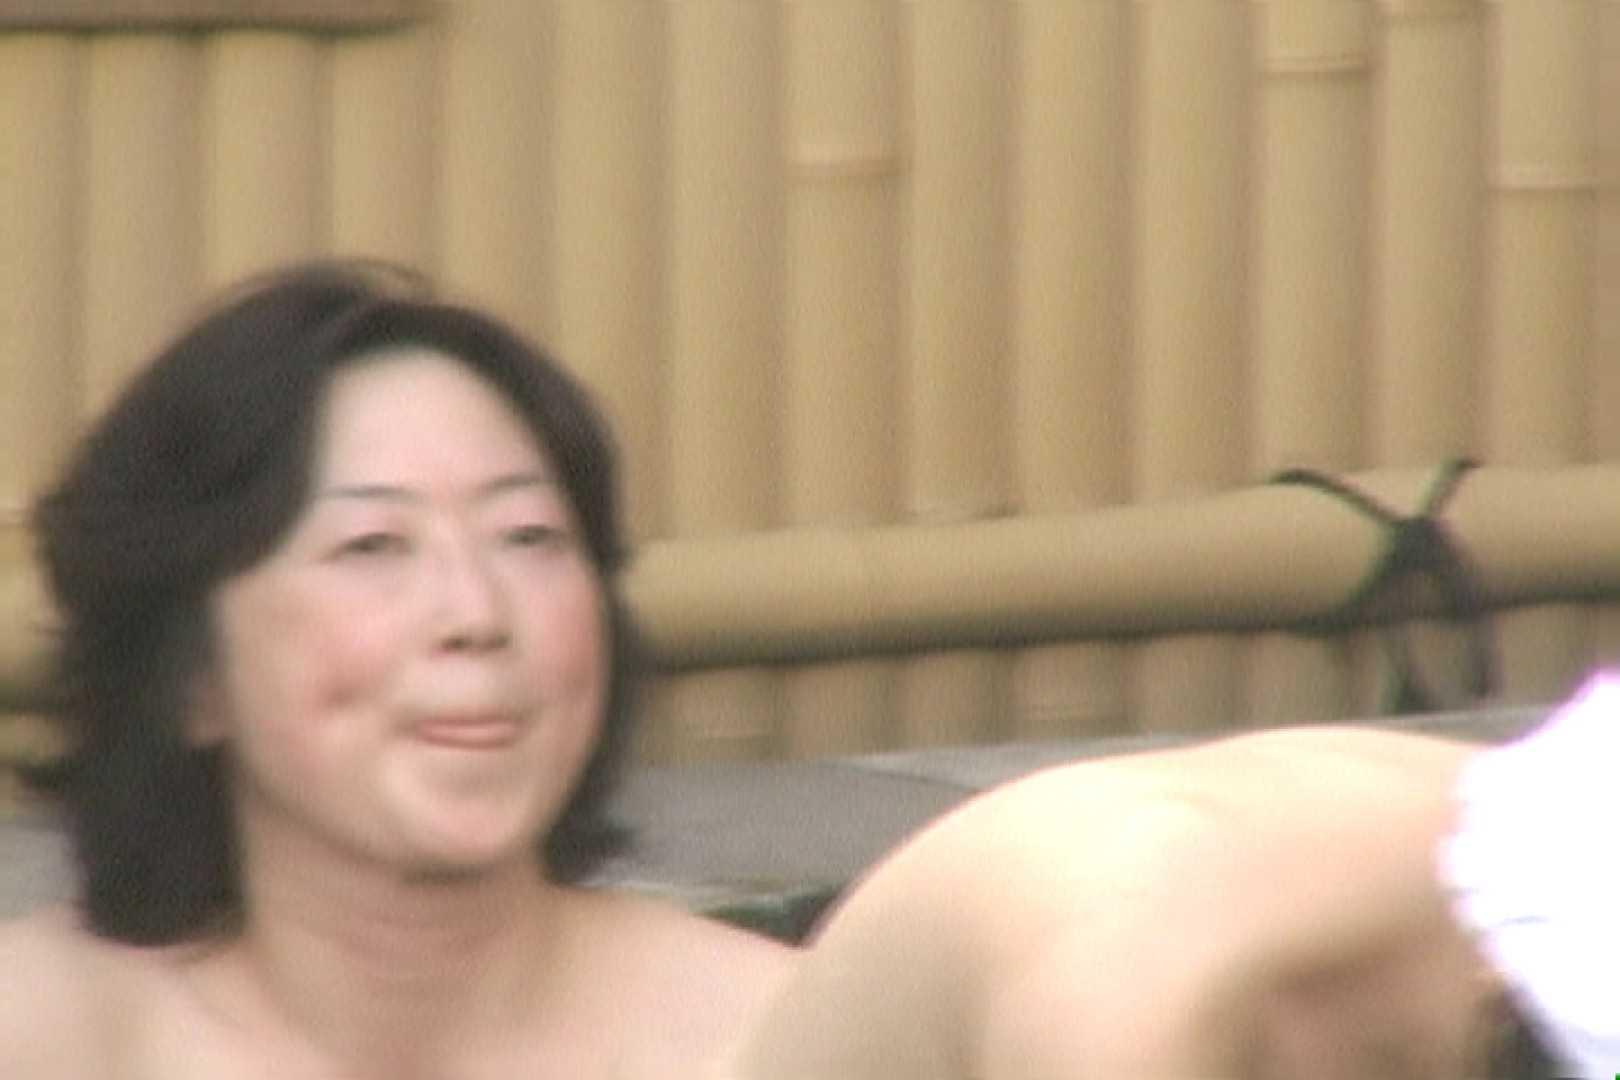 Aquaな露天風呂Vol.627 盗撮シリーズ | 露天風呂編  85PIX 77